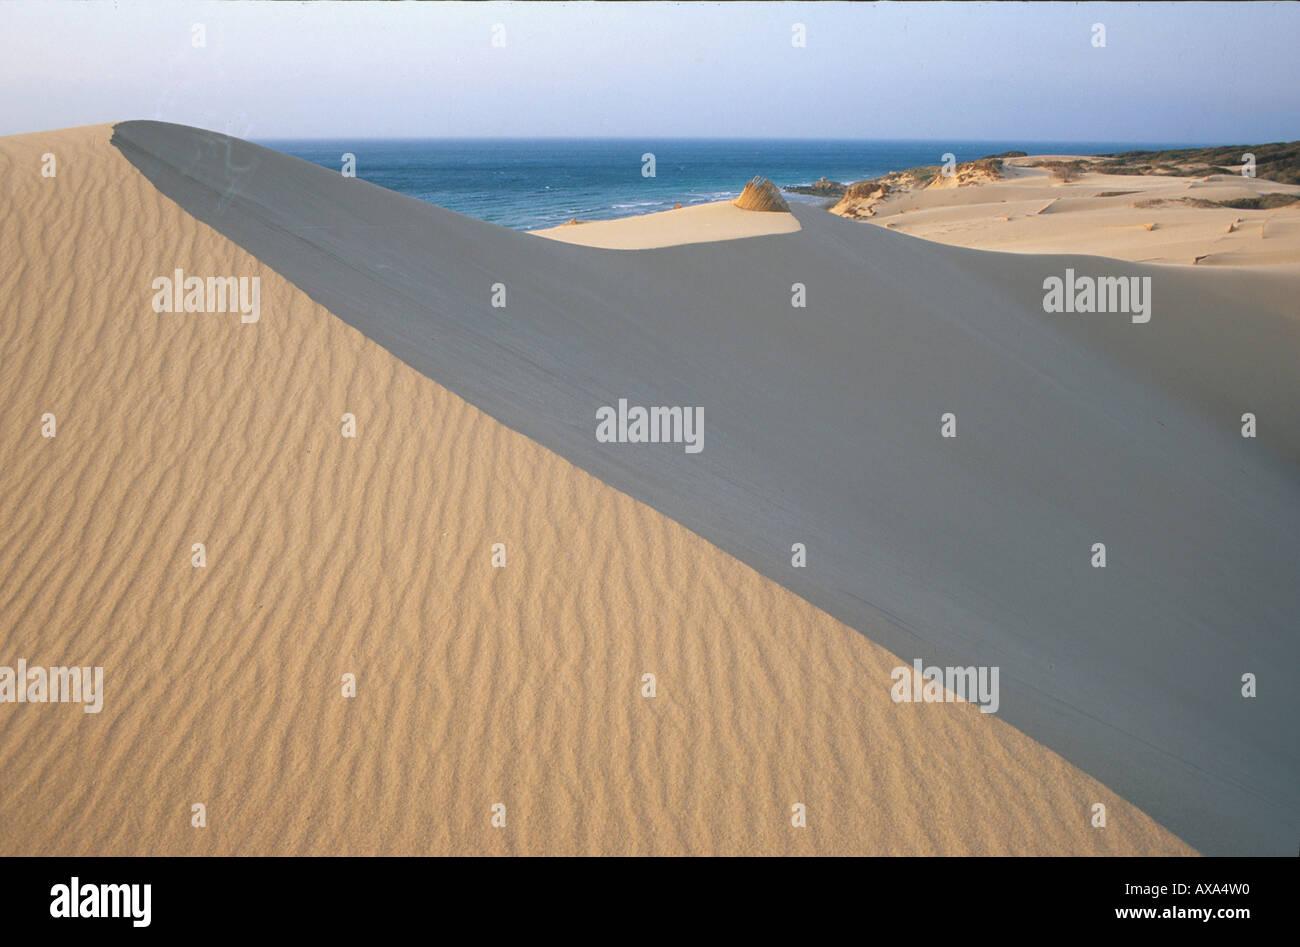 Duenen von Punta Paloma, Tarifa, Costa de la Luz, Cádiz, Andalusien Spanien, Europa - Stock Image